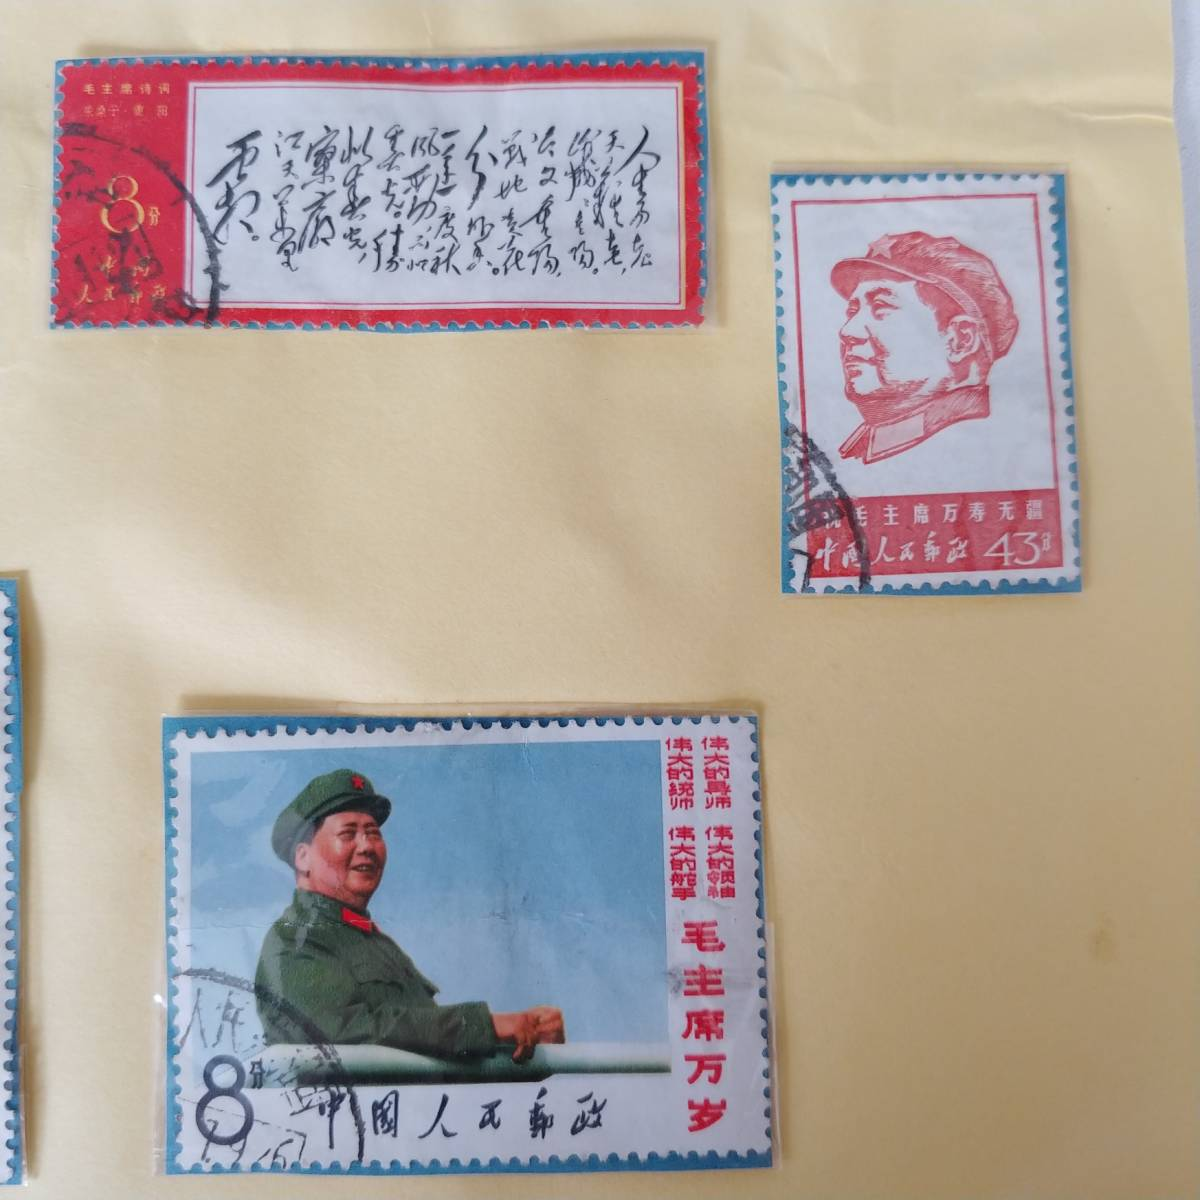 中国切手 毛沢東 毛主席 中国人民郵政 使用済み 消印あり_画像3